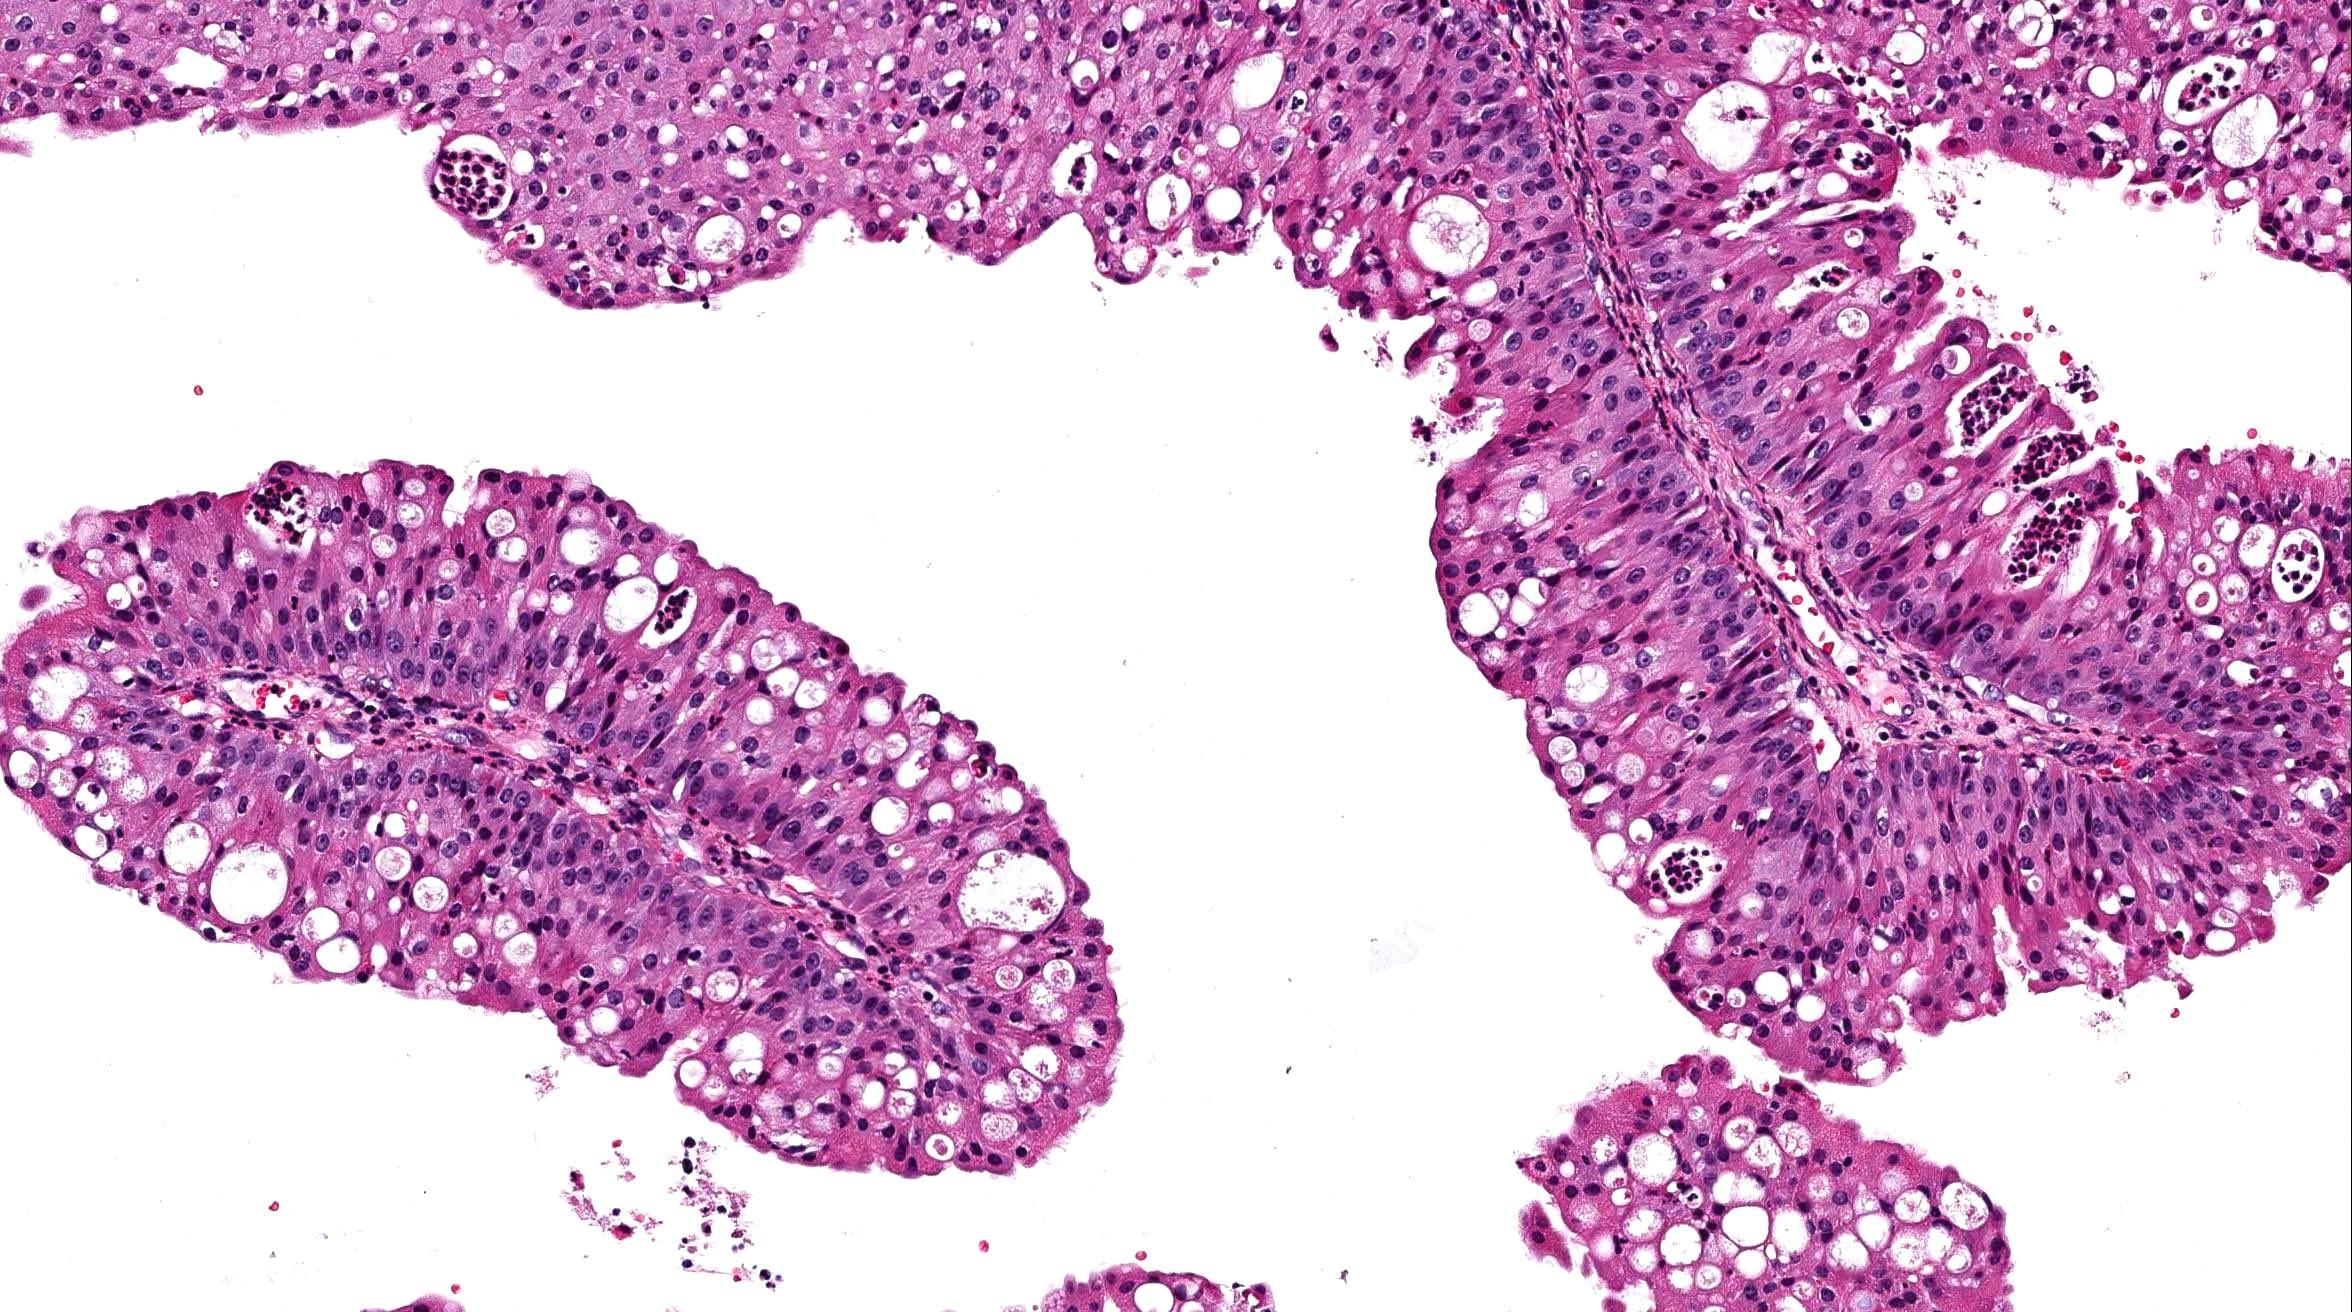 nasal papilloma pathology outlines